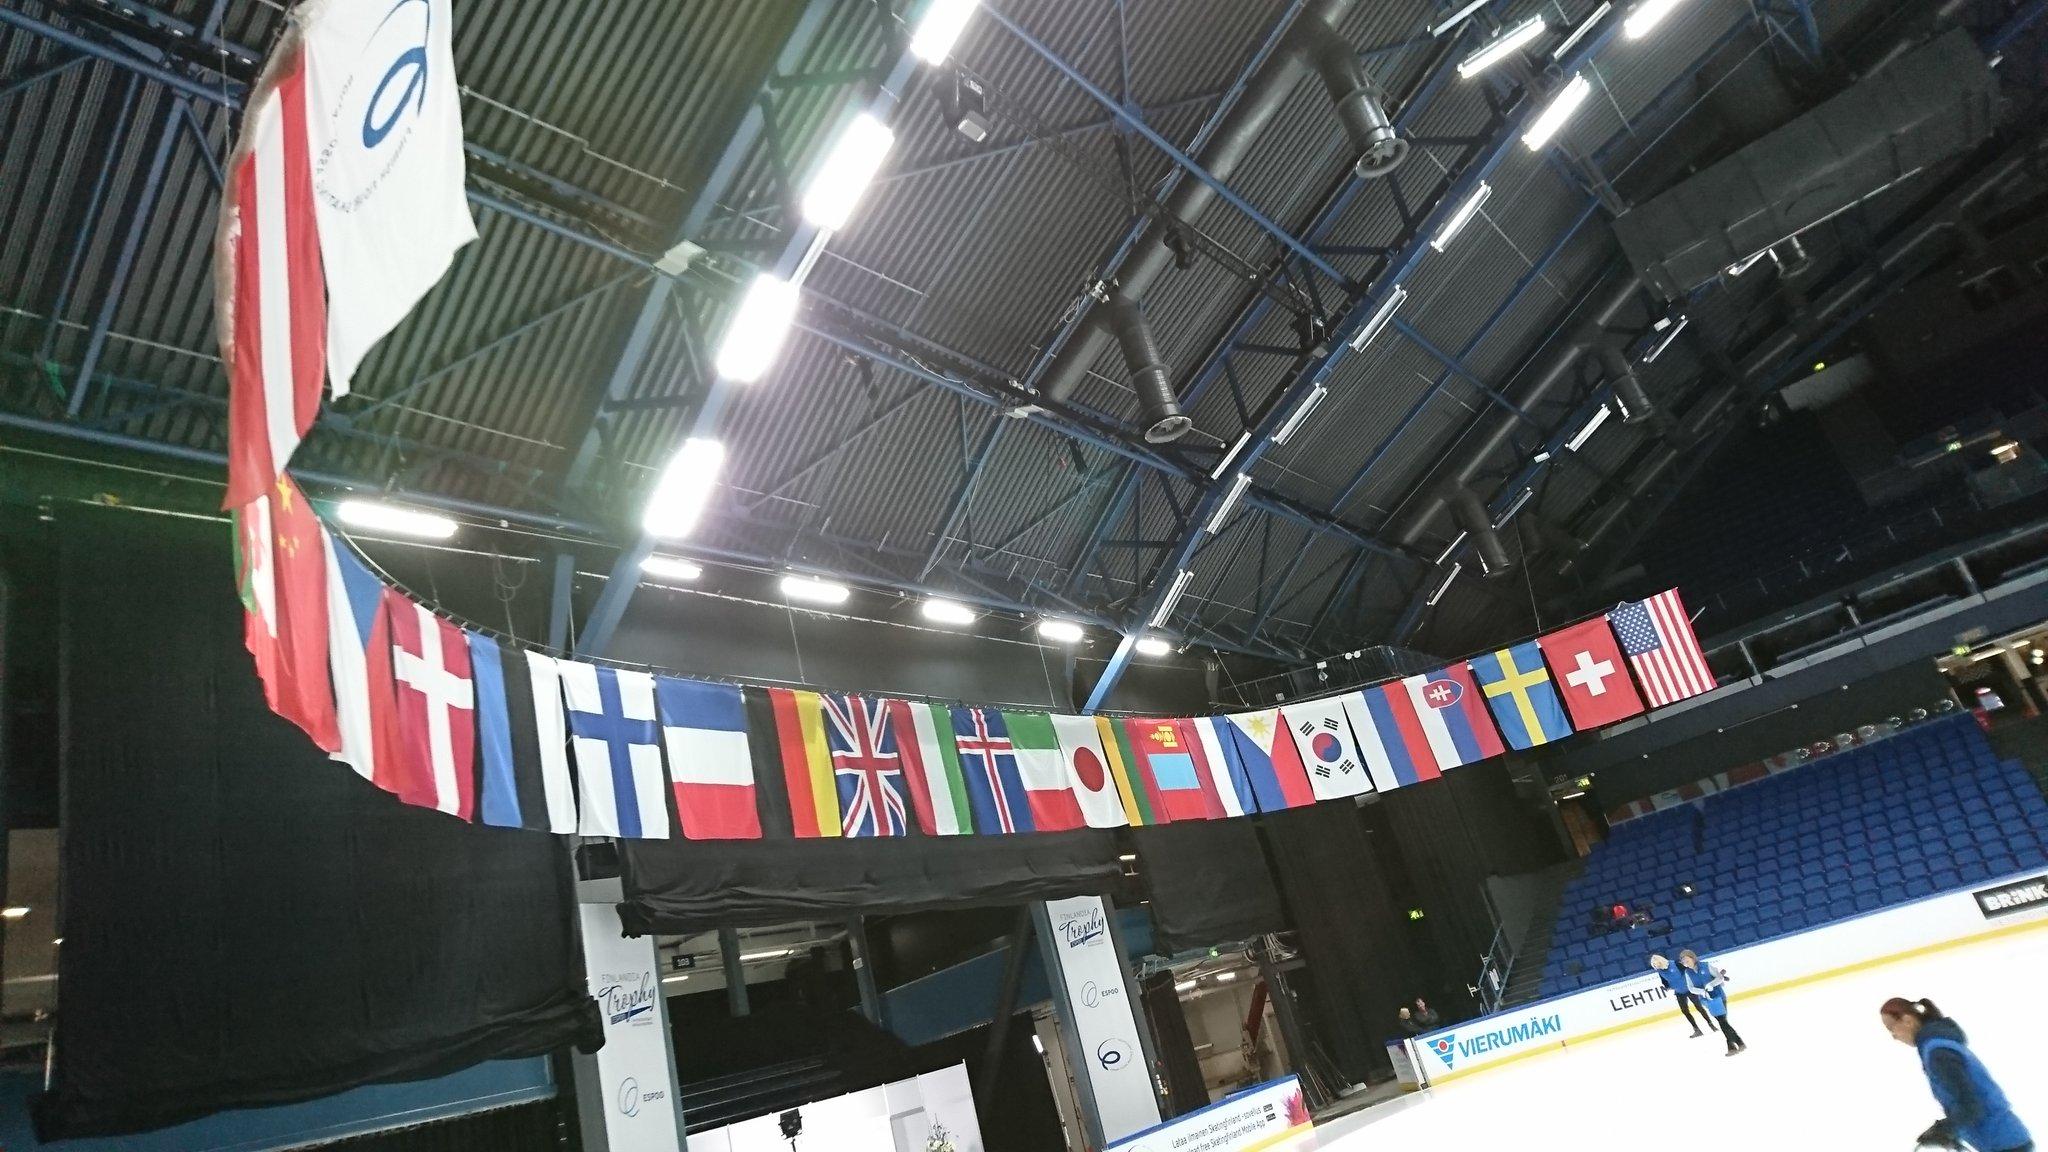 Challenger (6) - Finlandia Trophy. Oct 11 - 13, 2019. Espoo /FIN      - Страница 2 EGkseXXX0AAVOIU?format=jpg&name=4096x4096